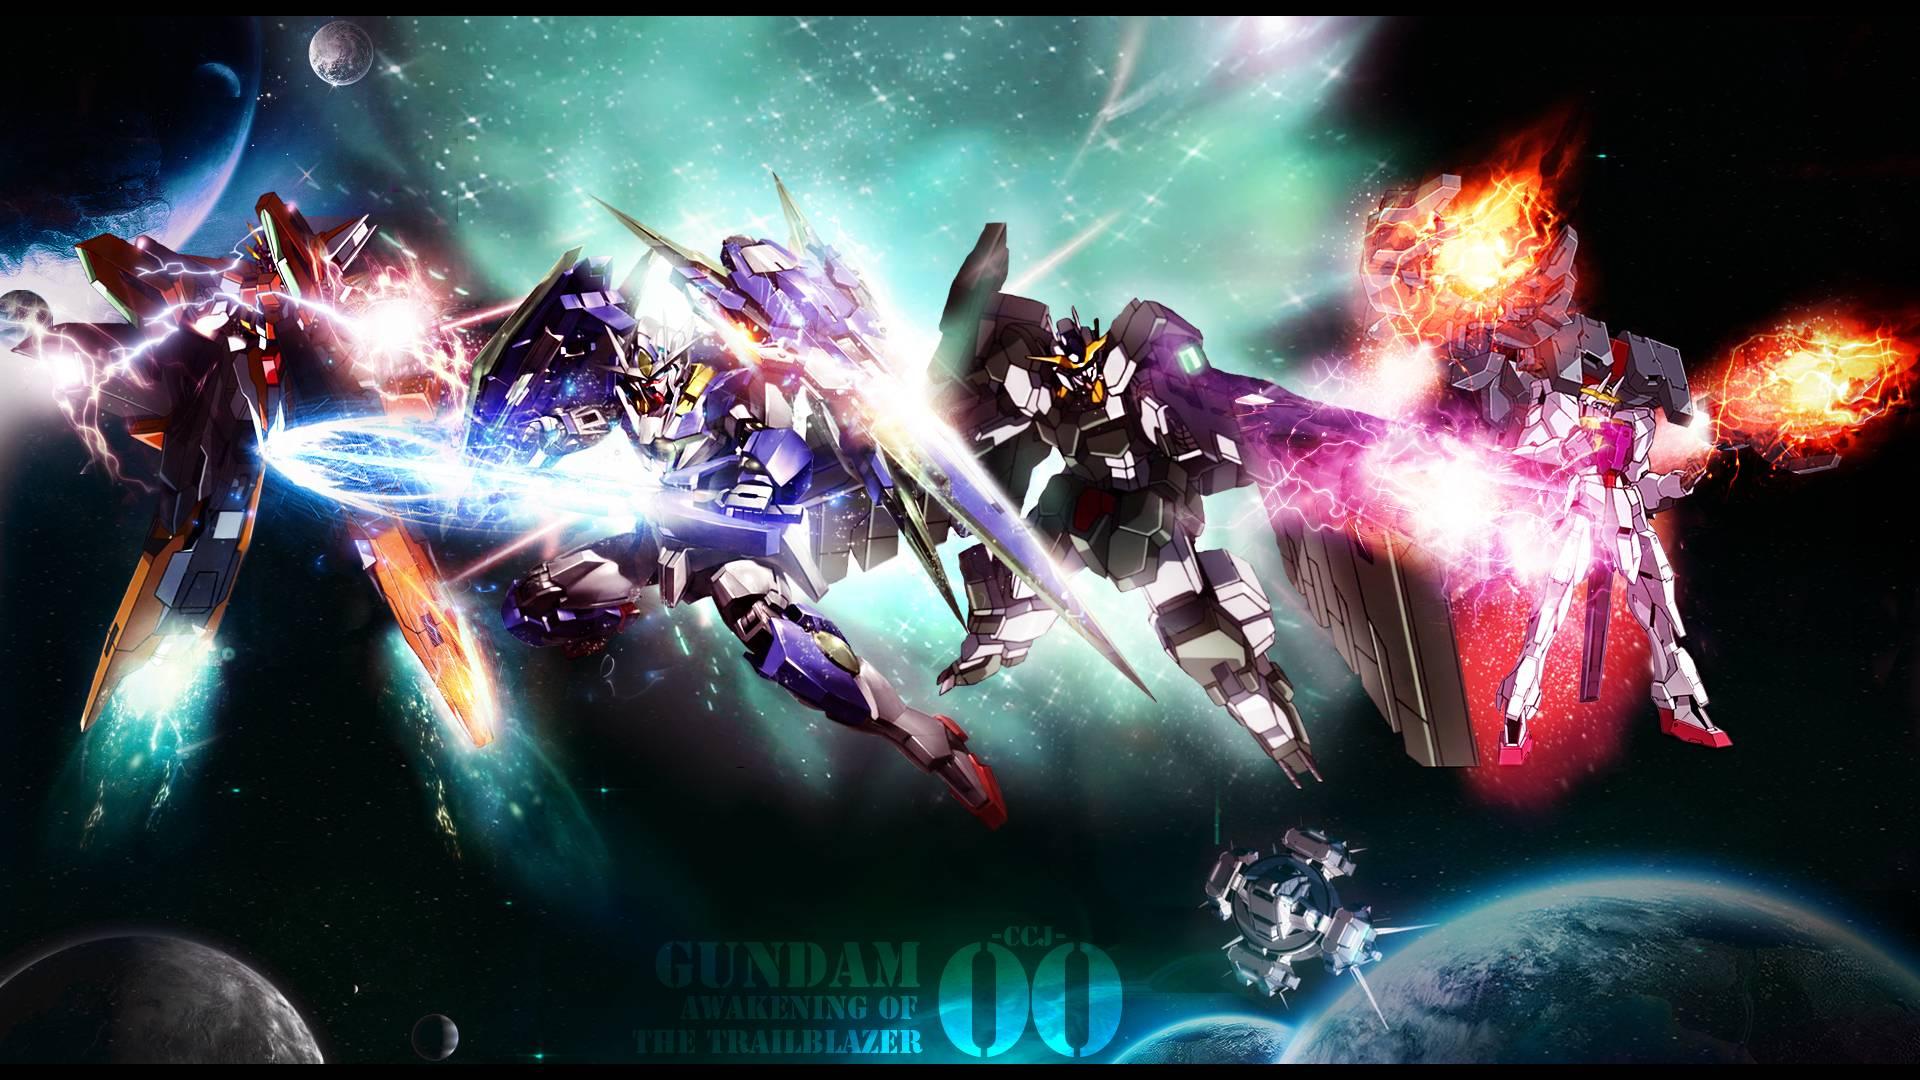 awakening of the trailblazer   Gundam 00 Wallpaper 1920x1080